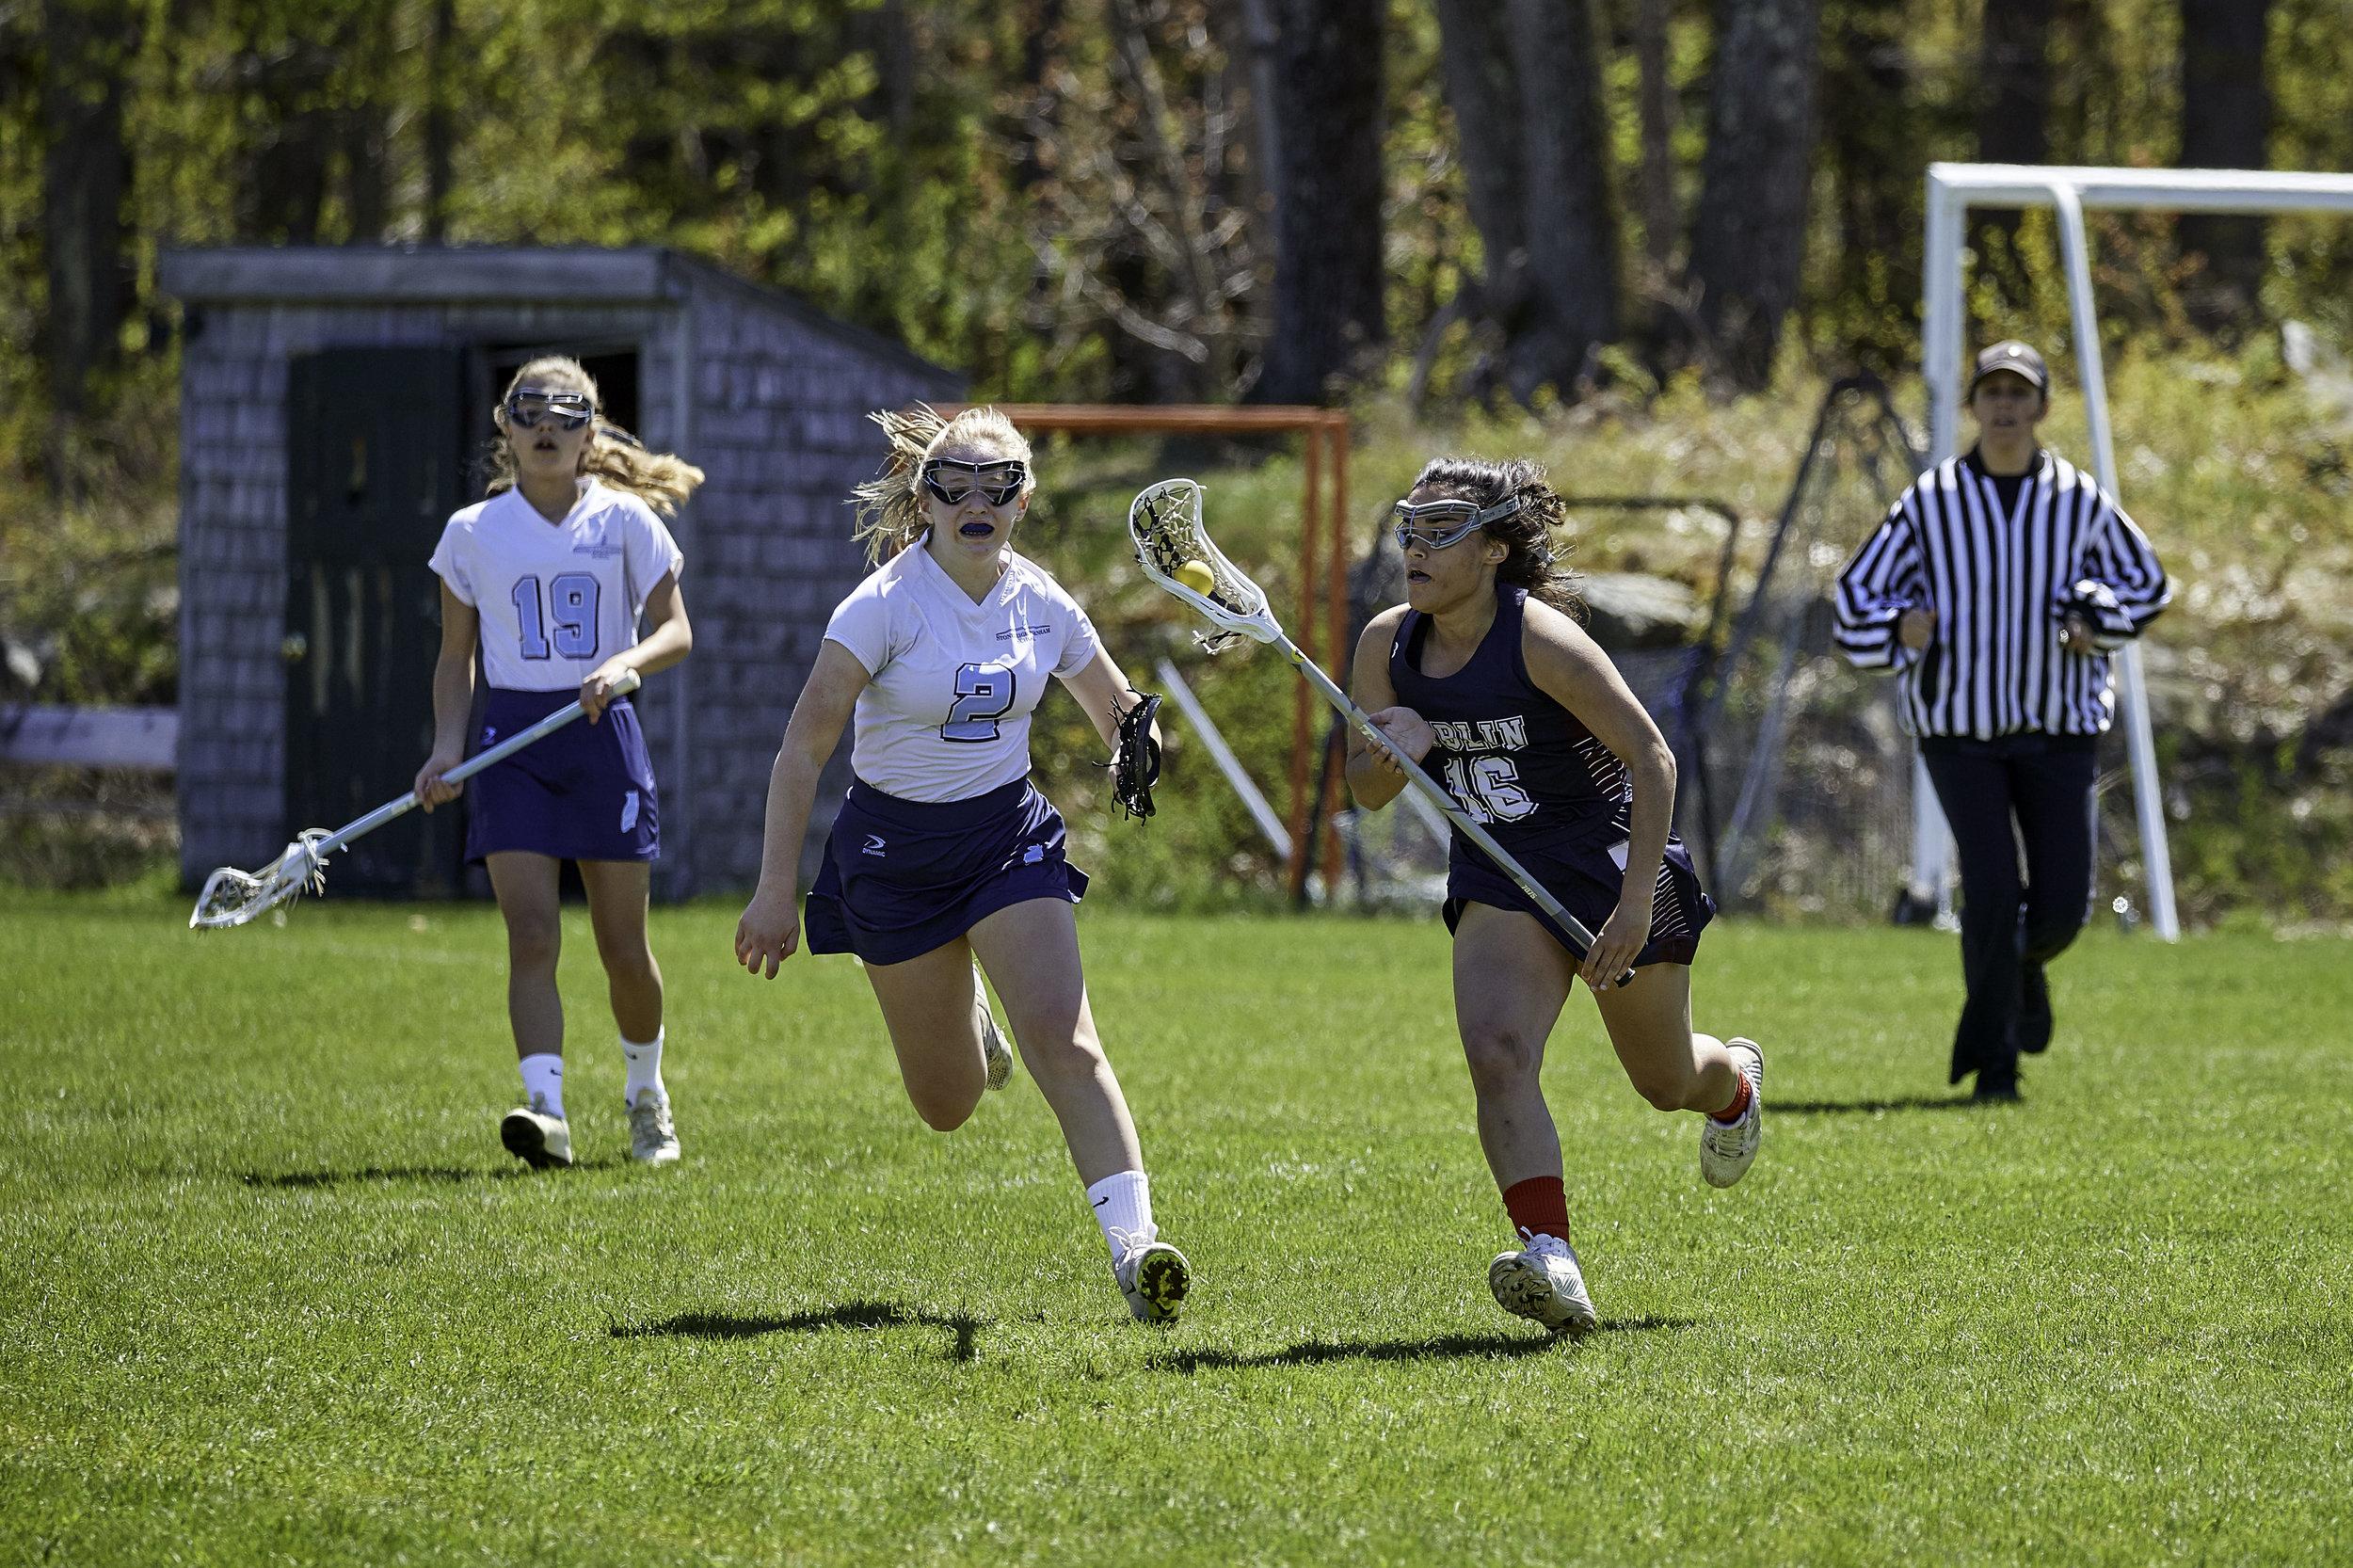 Girls Lacrosse vs. Stoneleigh Burnham School - May 11, 2019 - May 10, 2019193200.jpg